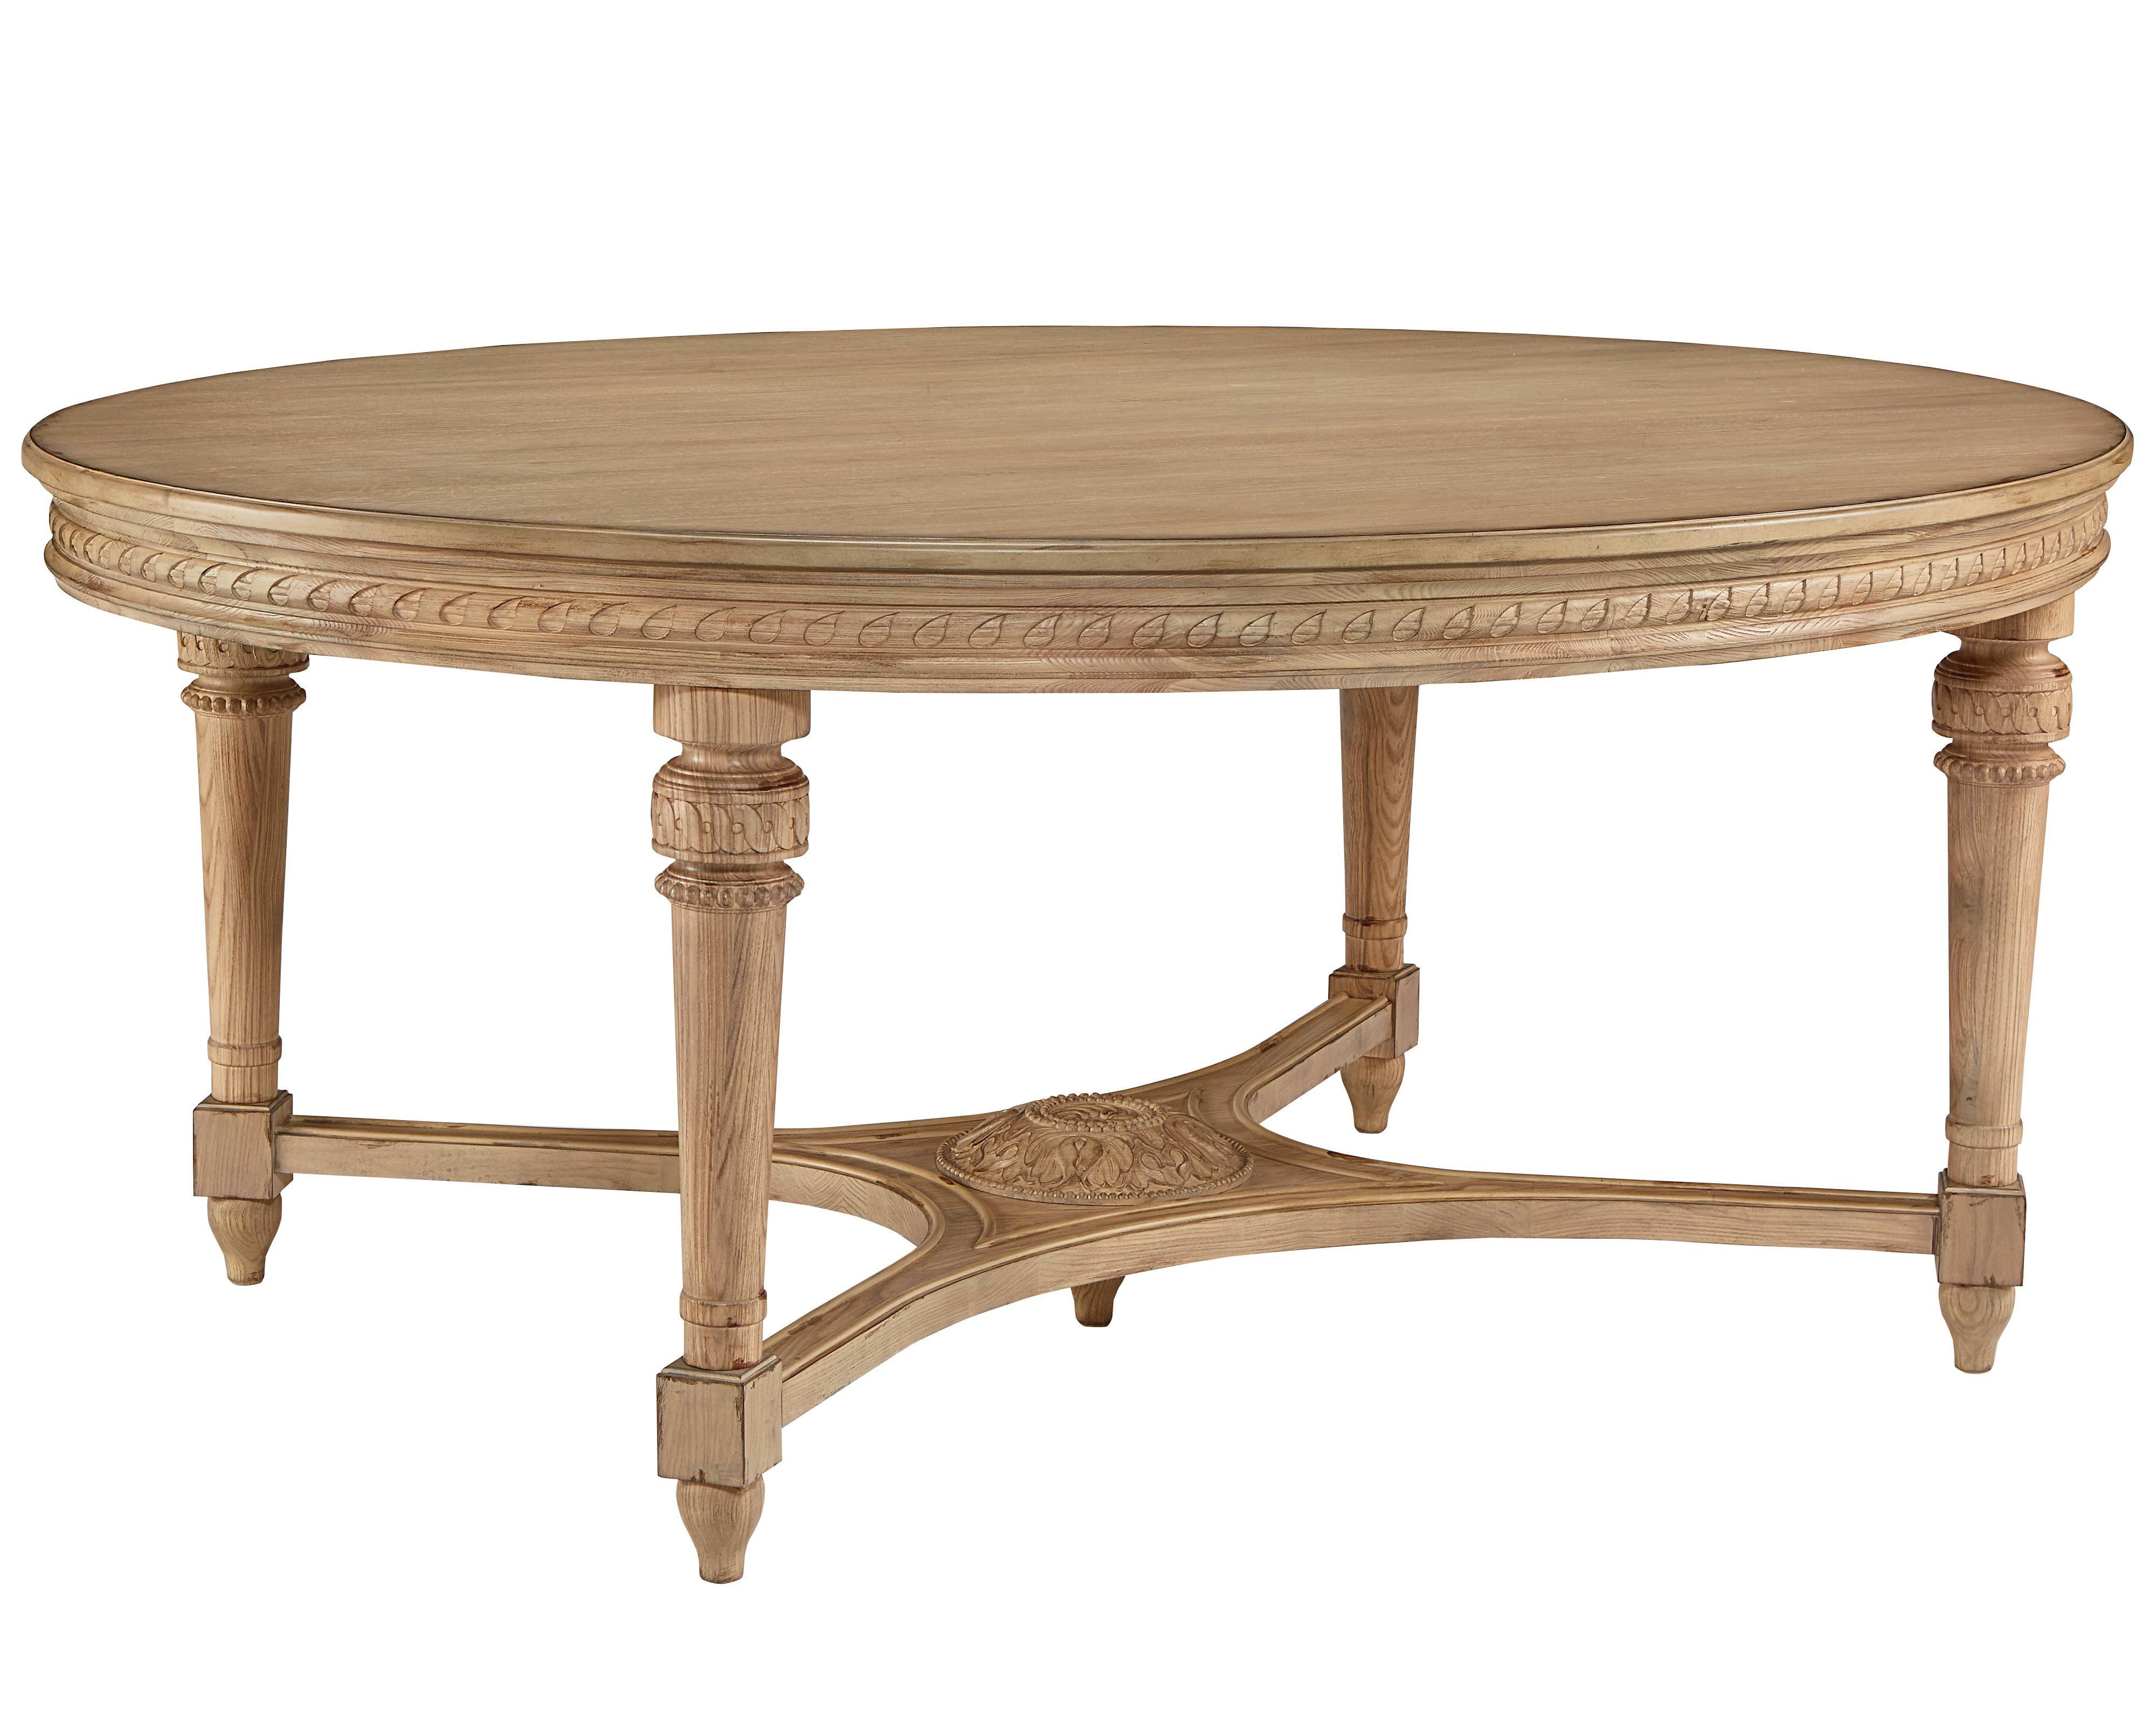 Park Art My WordPress Blog_Large Oval Farmhouse Dining Table